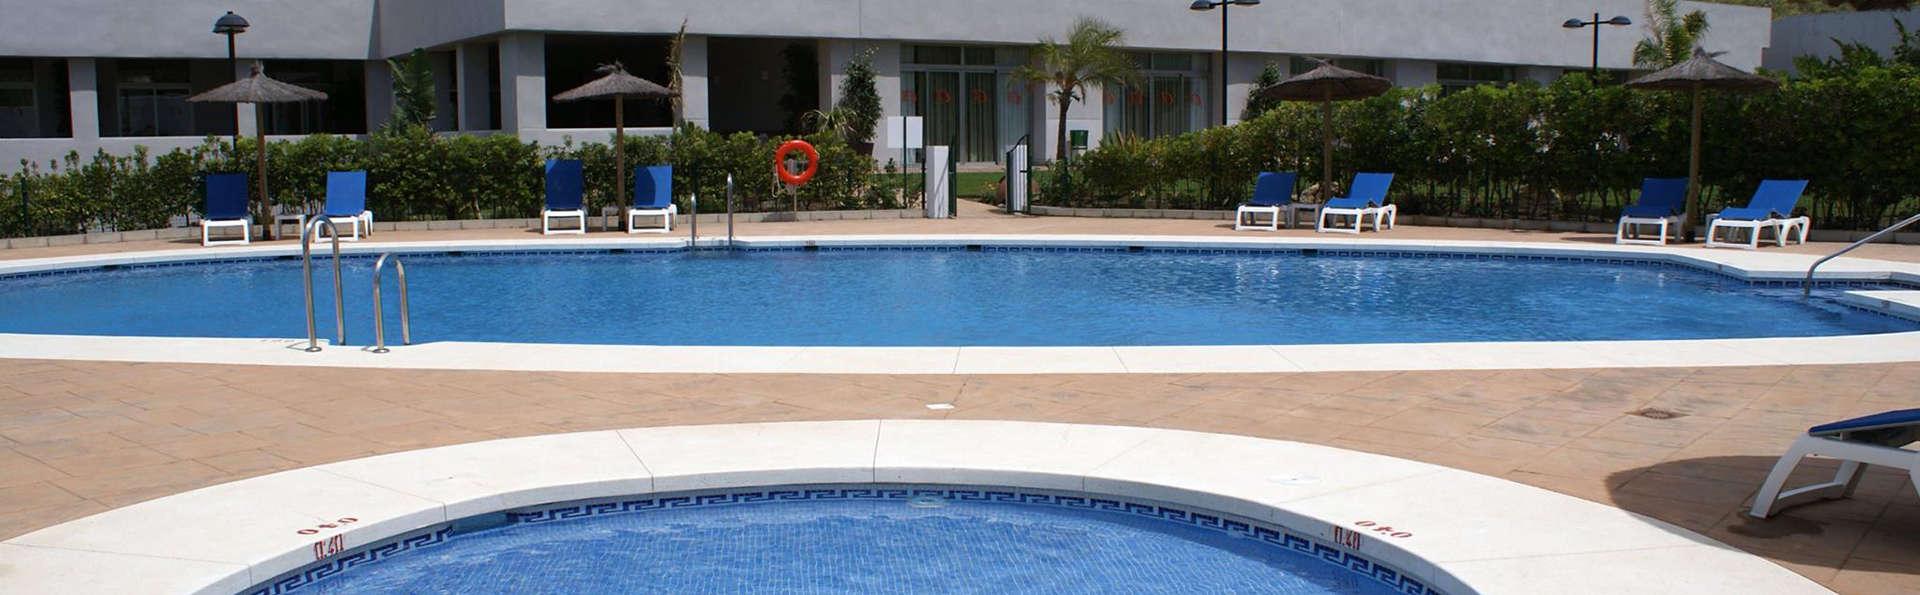 Hotel Montera Plaza - EDIT_pool1.jpg